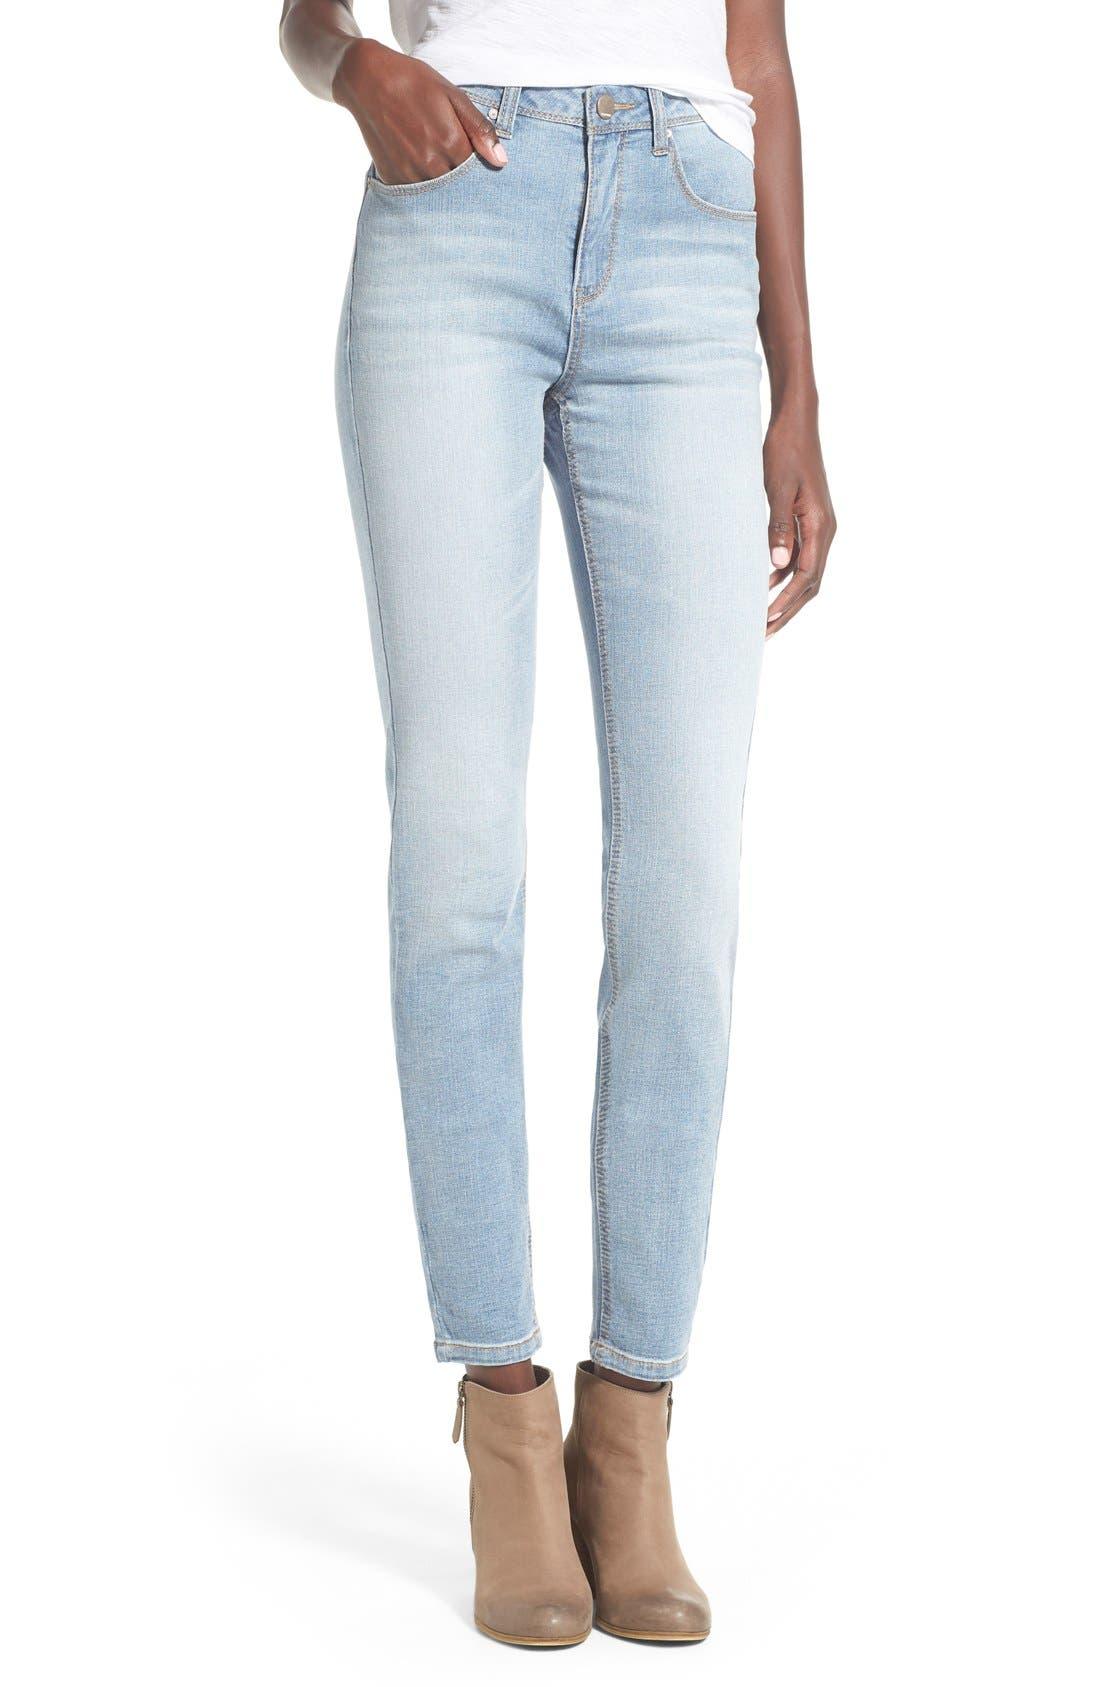 Main Image - Generra High Waist Skinny Jeans (Mastic)